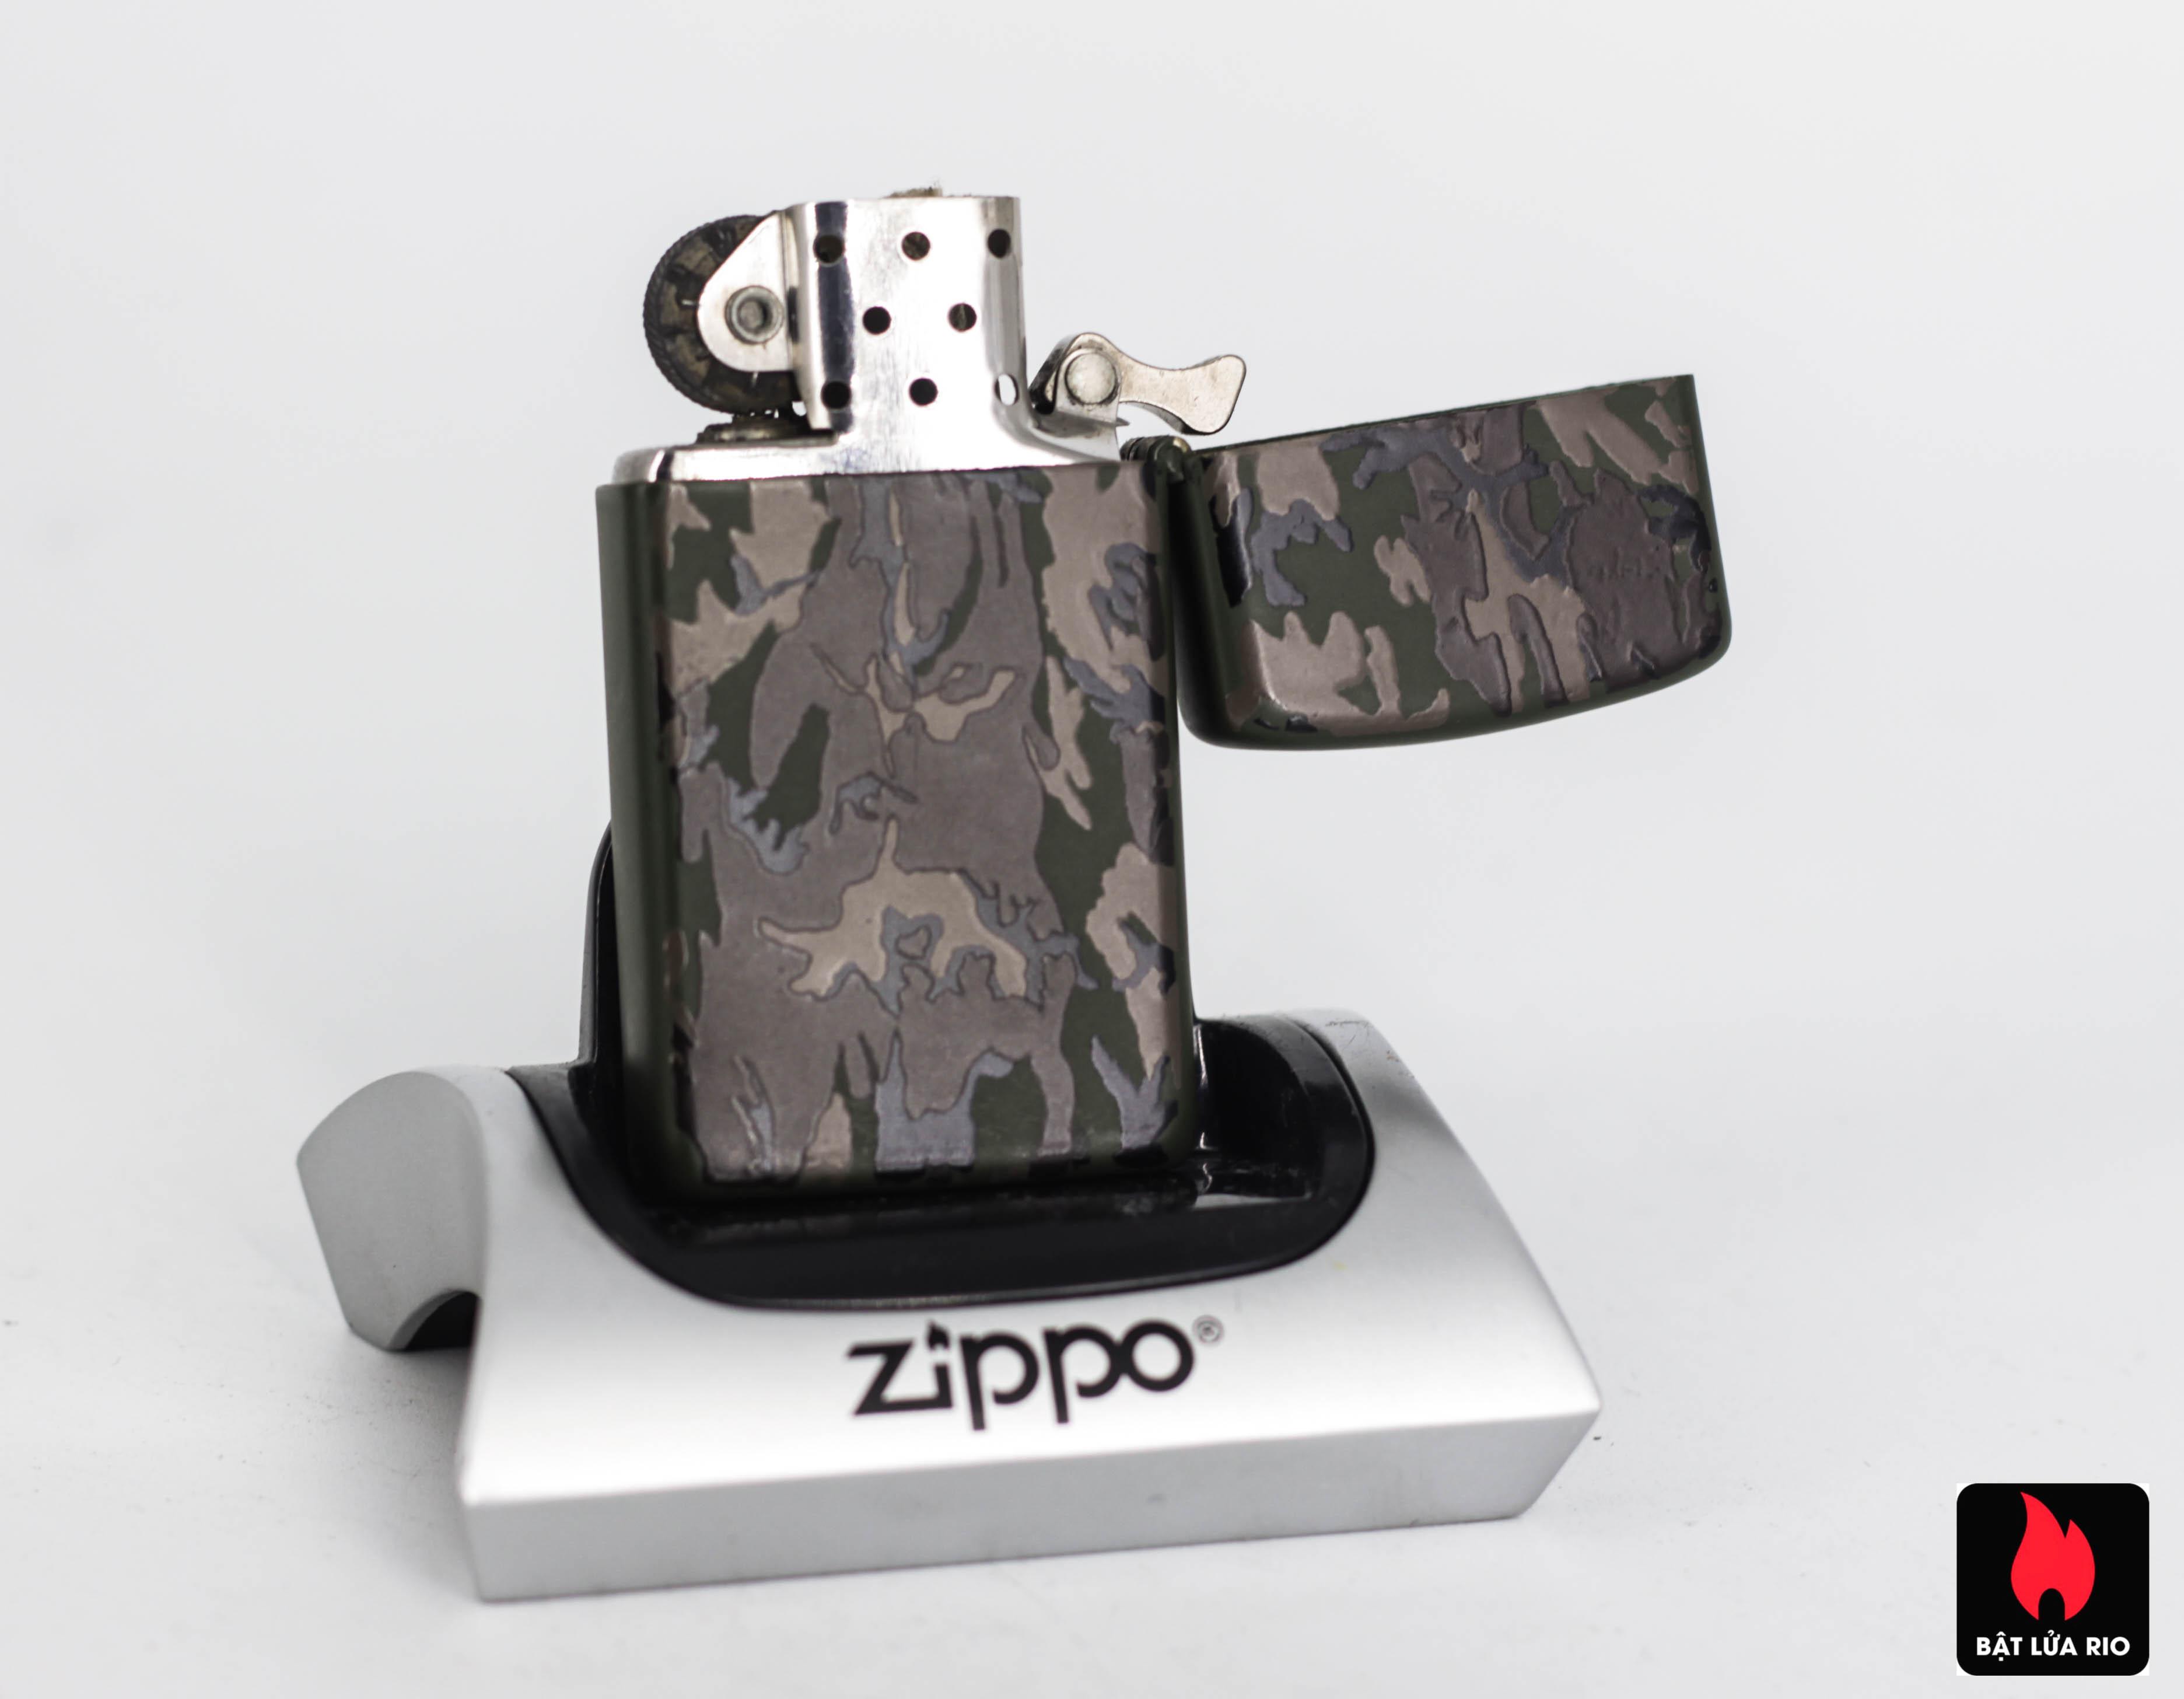 Zippo Slim 1992 - Camo - Uss Theodore Roosevelt CVN 71 3